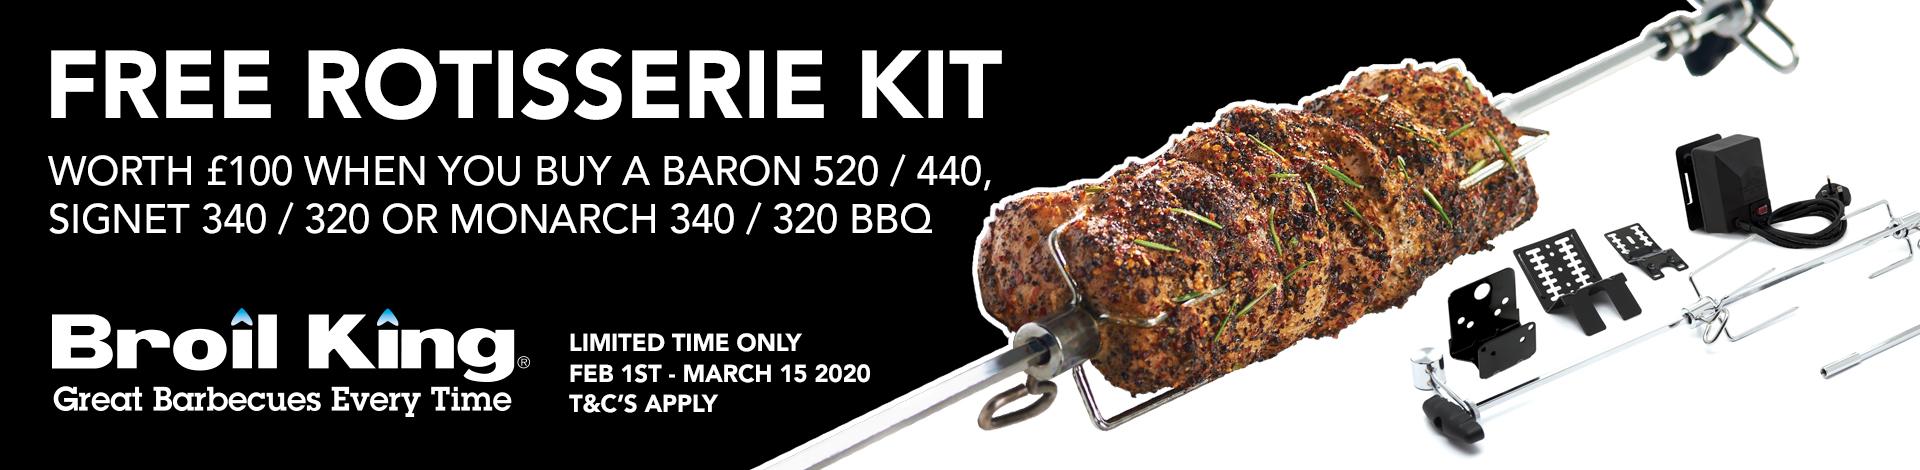 Broil King Free Premium Rotisserie Kit